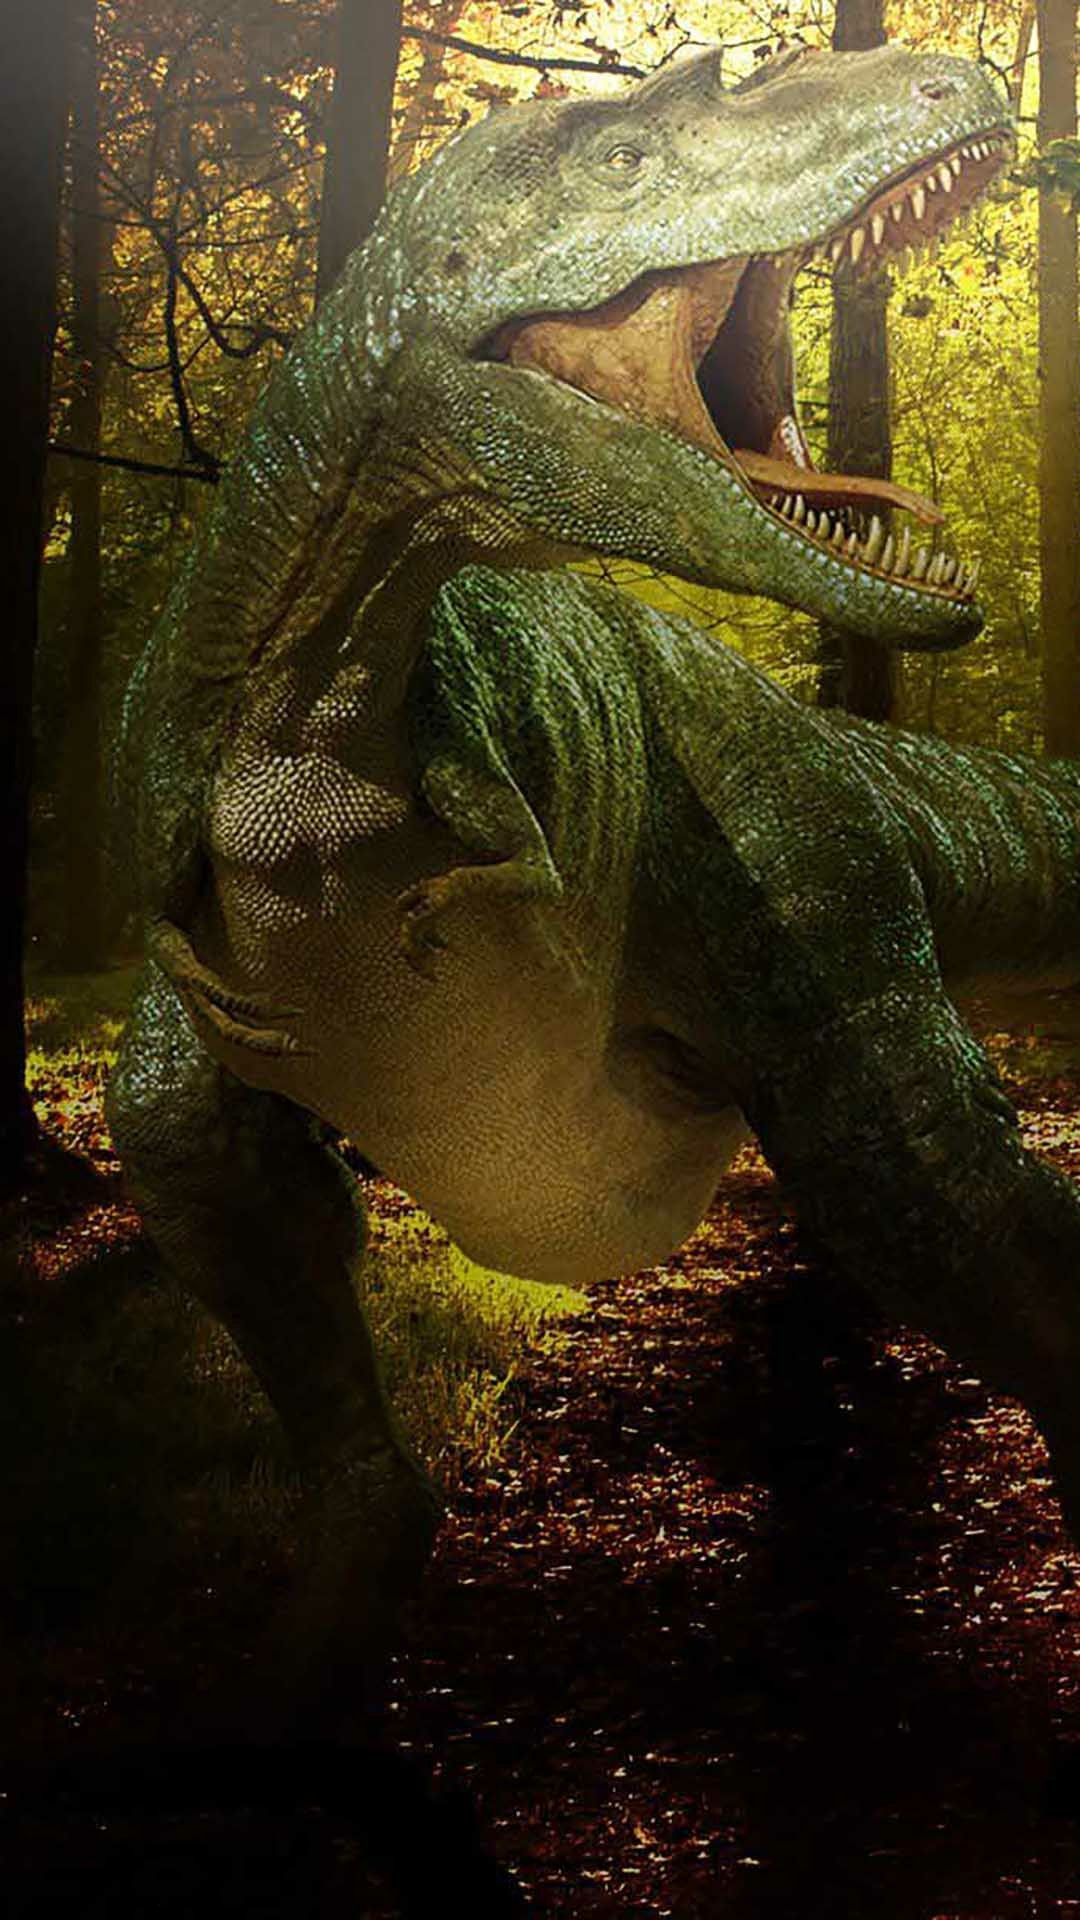 Indominus Rex Jurassic World Image World Images Jurassic Park World Jurassic World